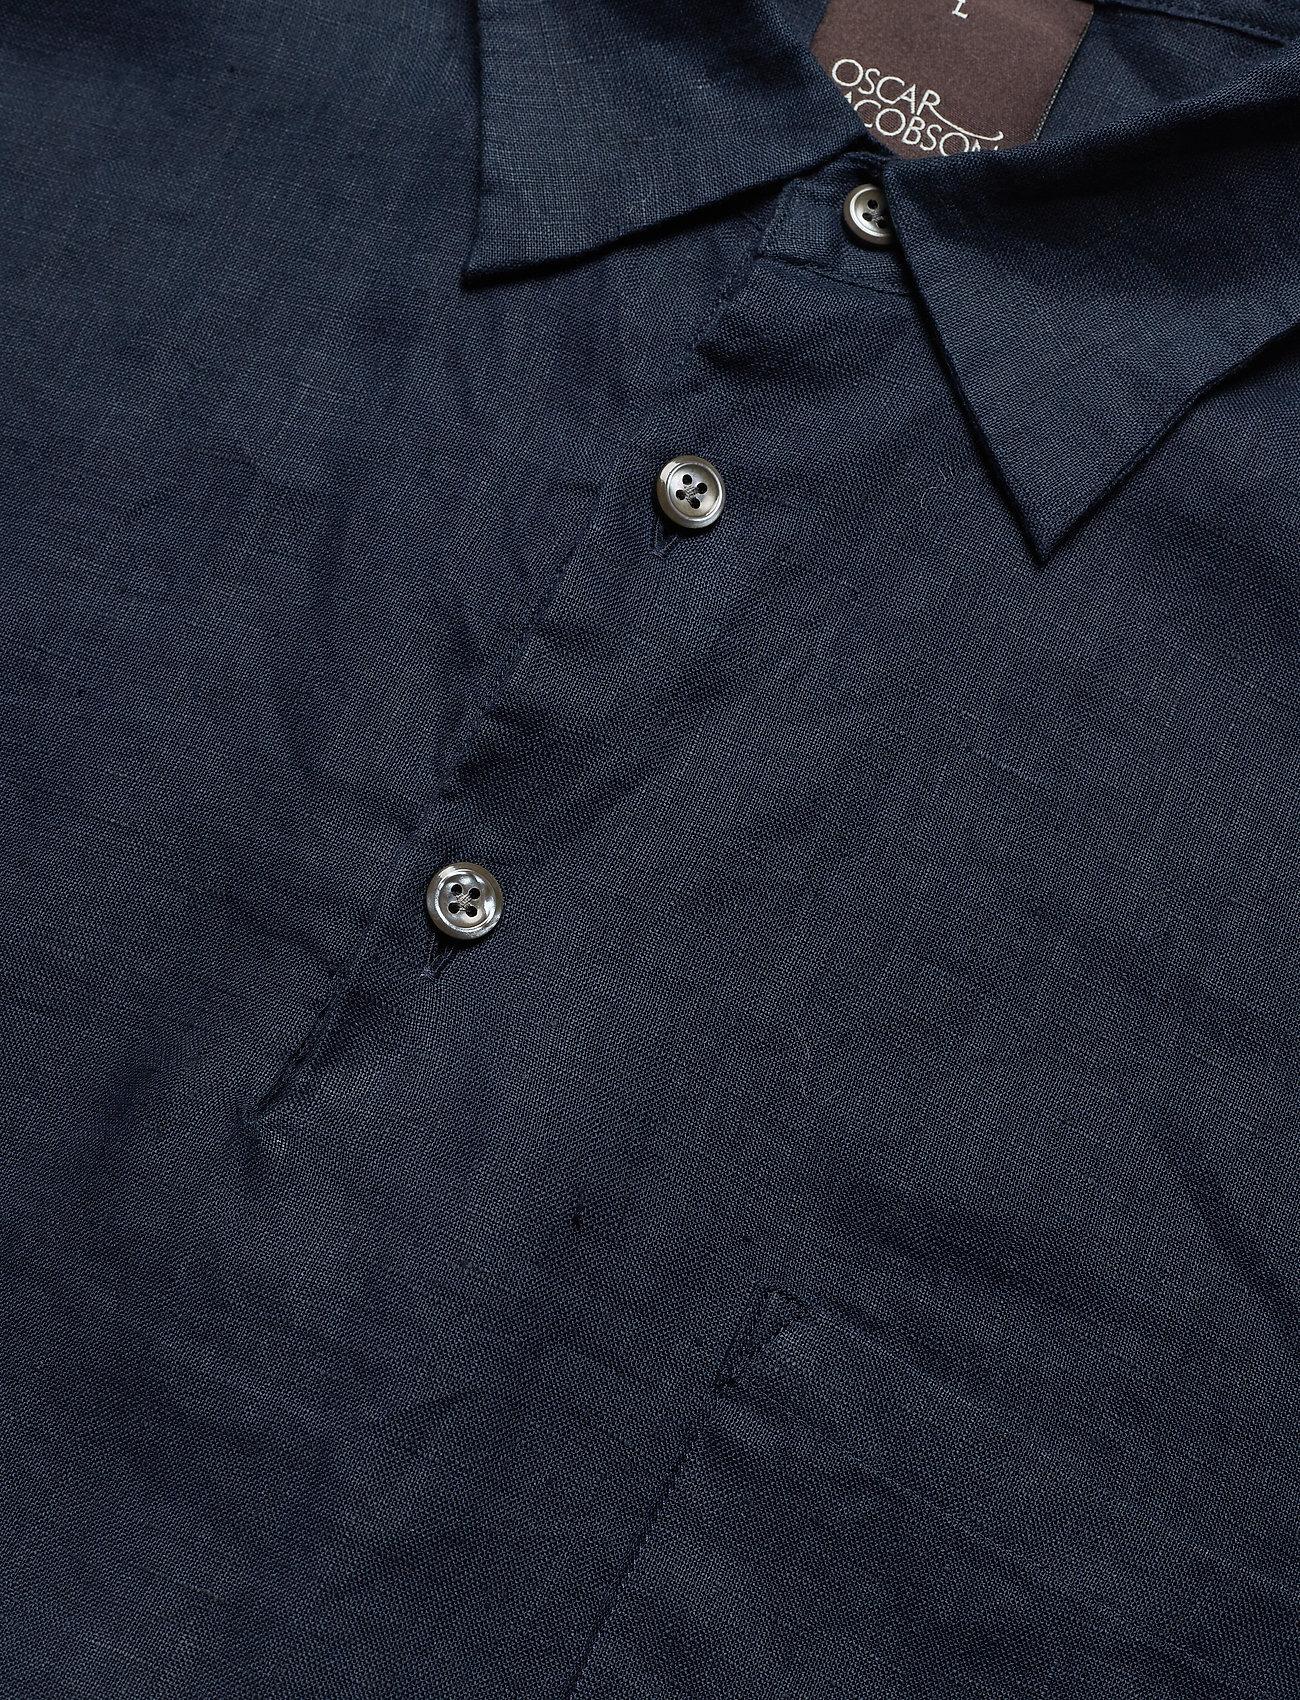 Jacobson Hadi Reg Wash222Dark BlueOscar Shirt 9IE2WHD